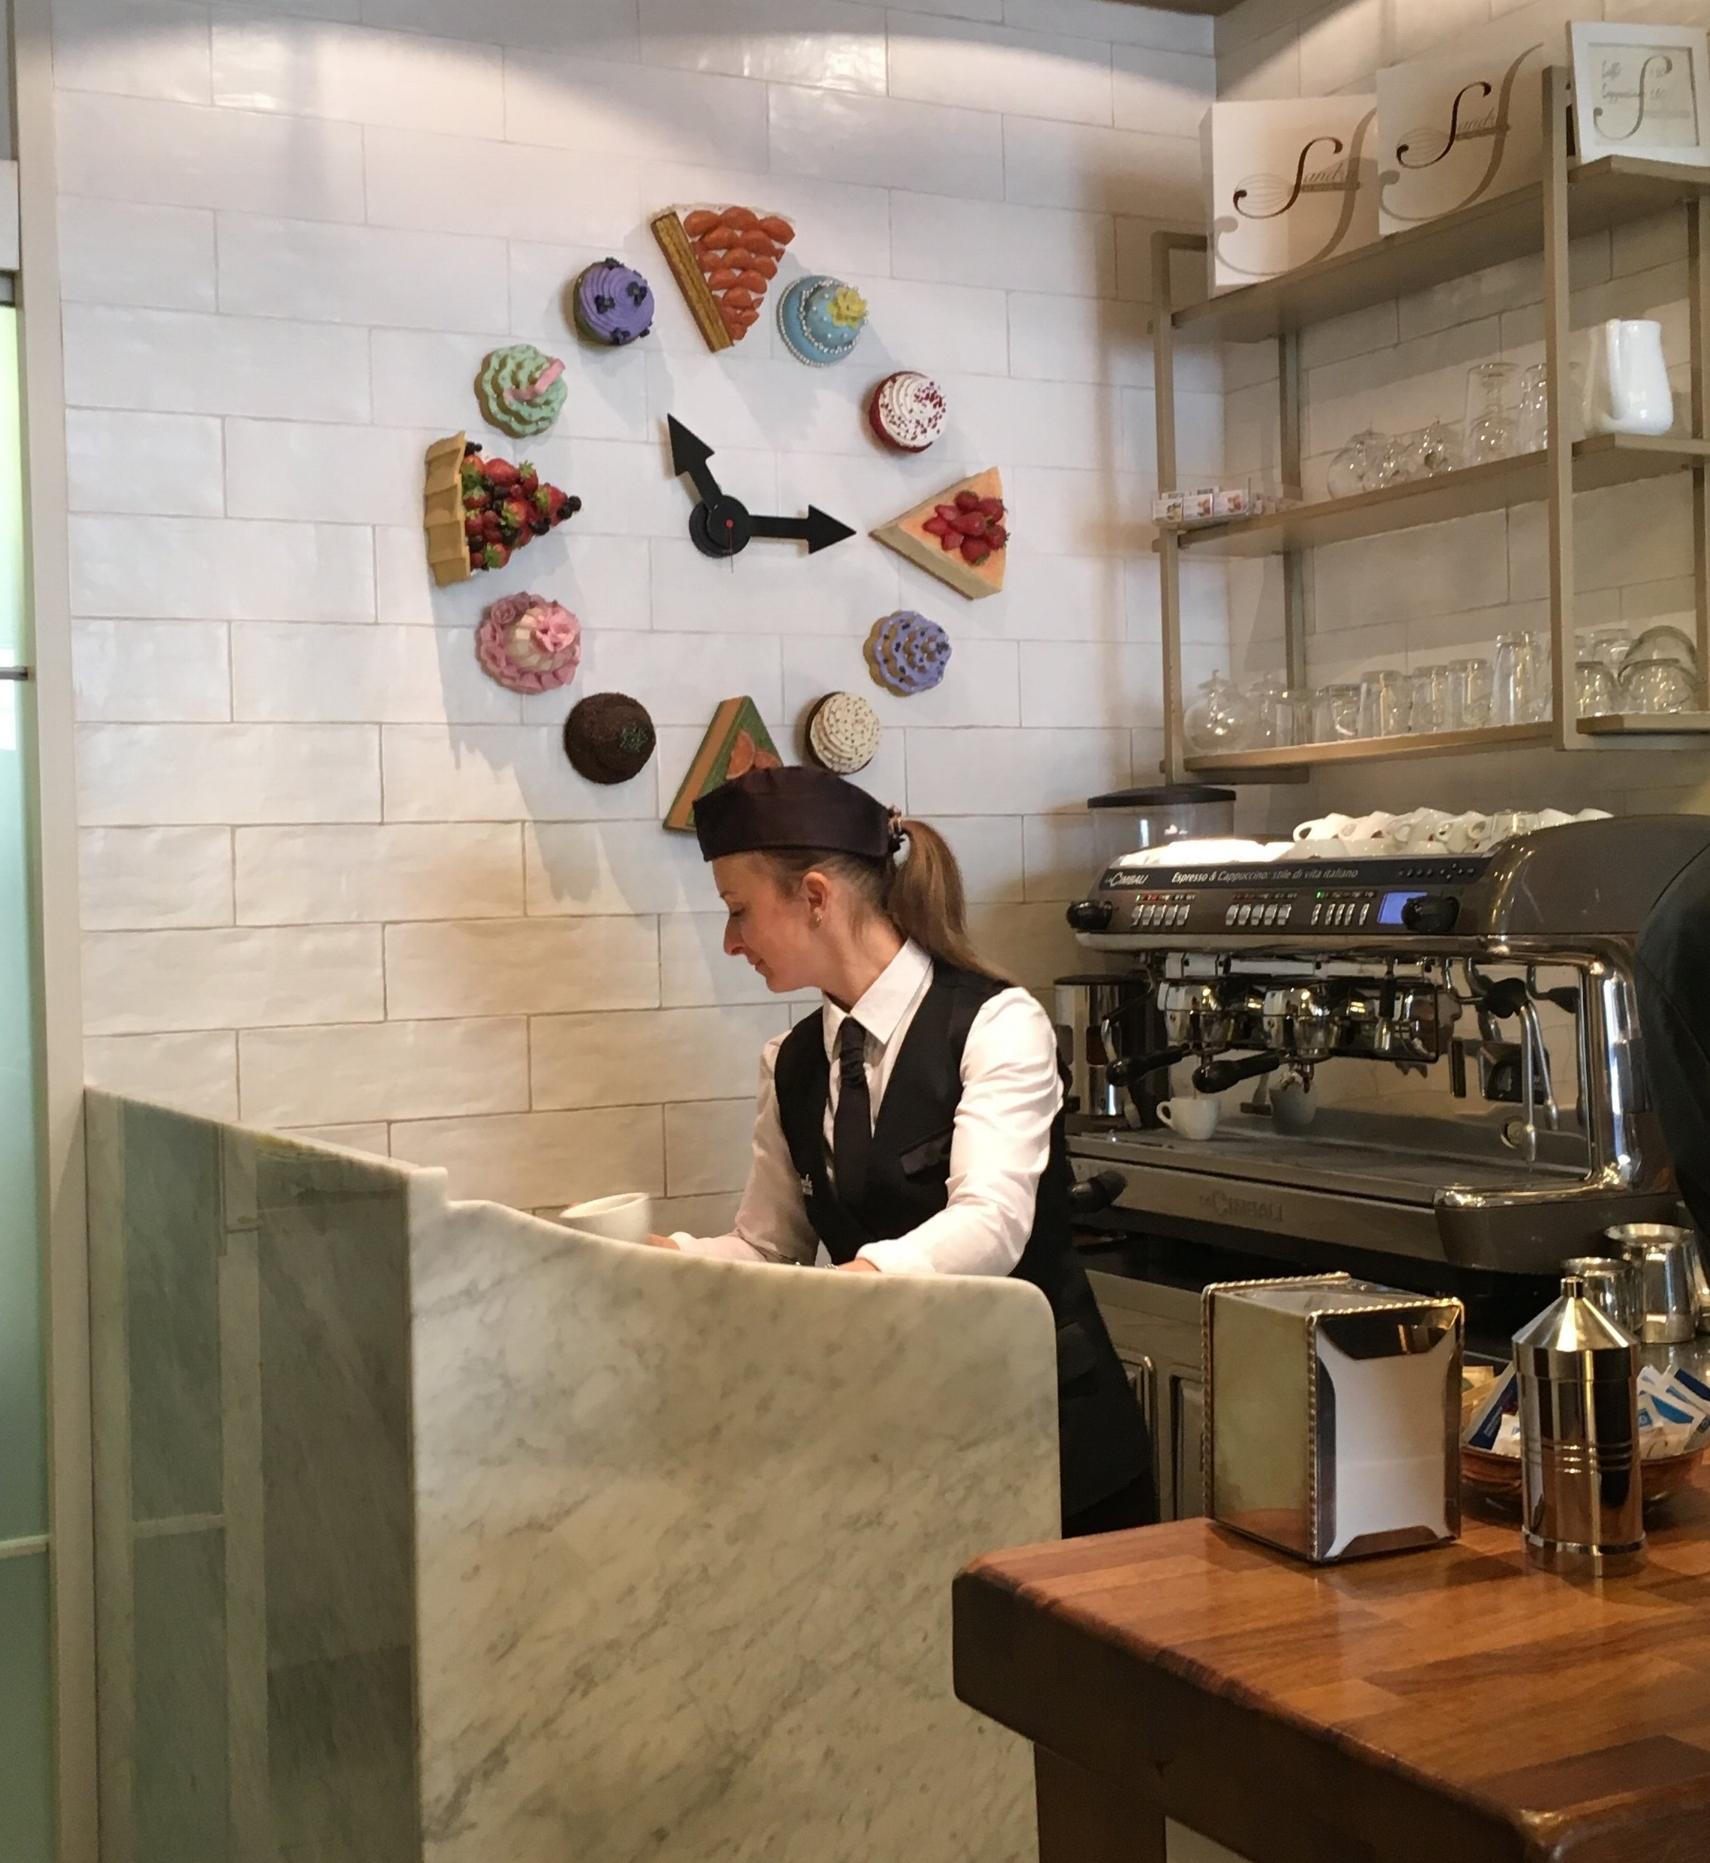 Hw fun is that clock over the coffee bar?